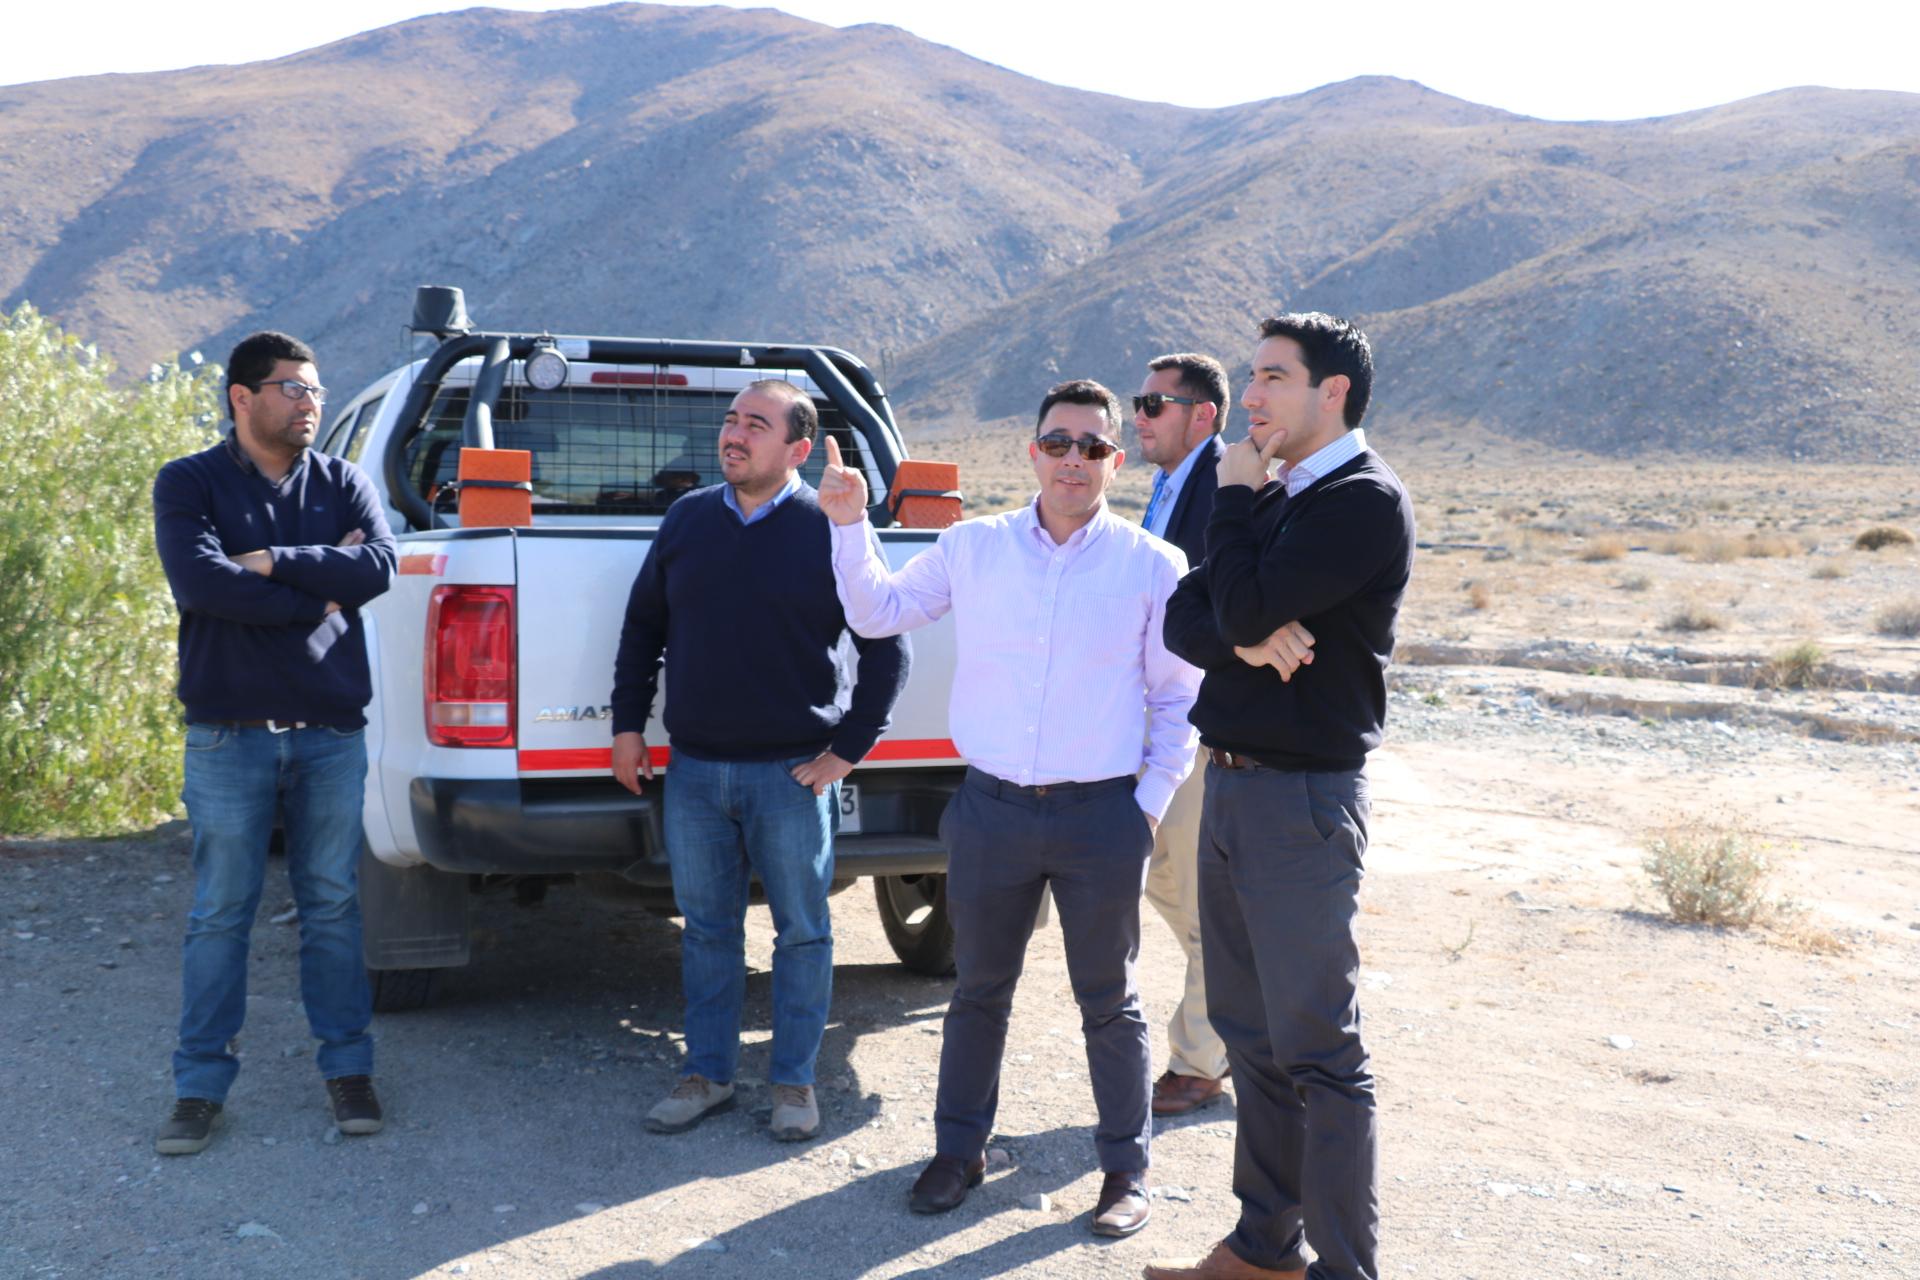 Realizan estudios para solución definitiva de abastecimiento de agua potable en Domeyko